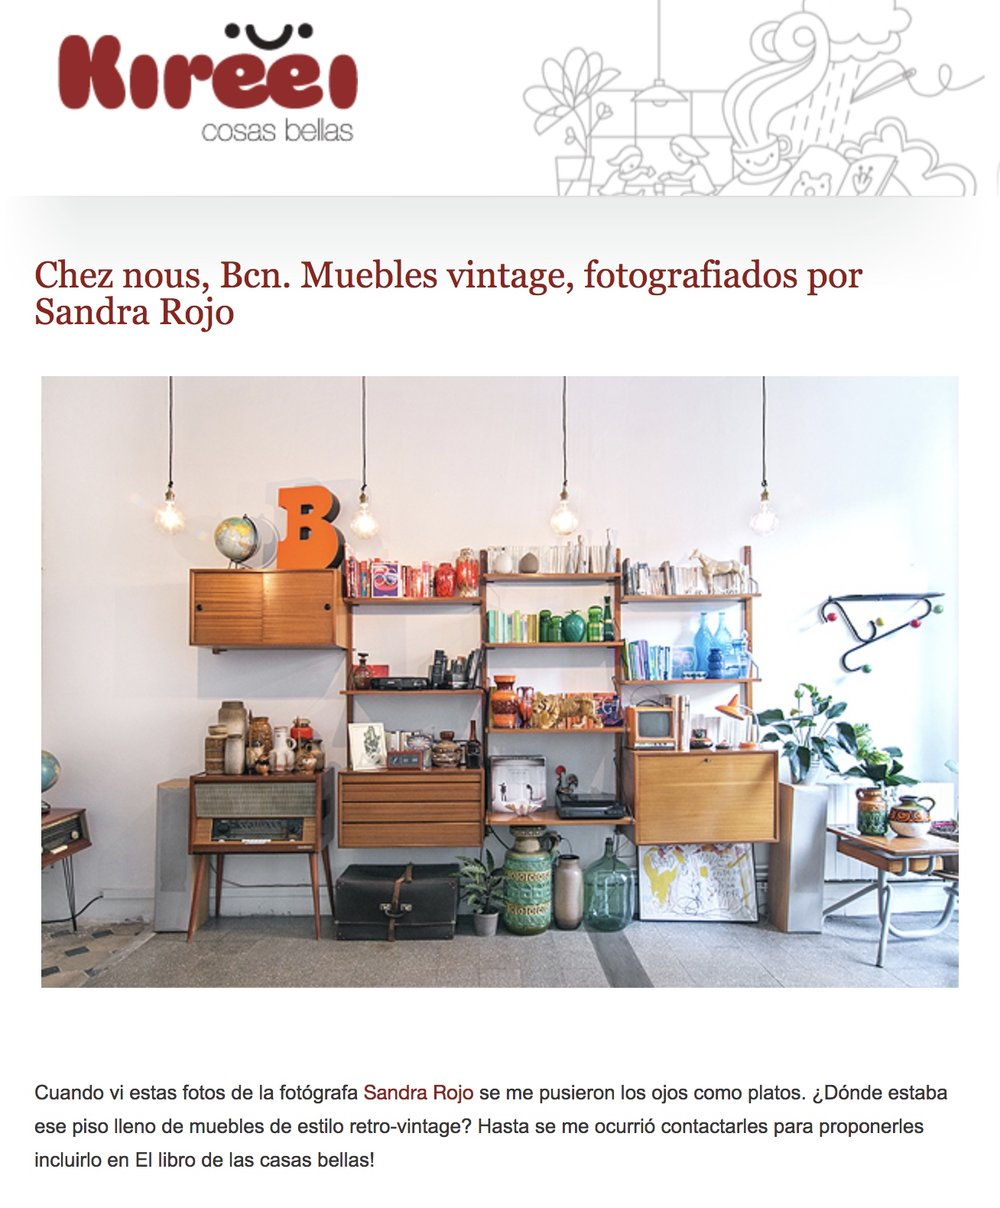 2016-05 Kireei - Chez nous, Bcn2016-05 Kireei - Chez nous, Bcn.jpeg